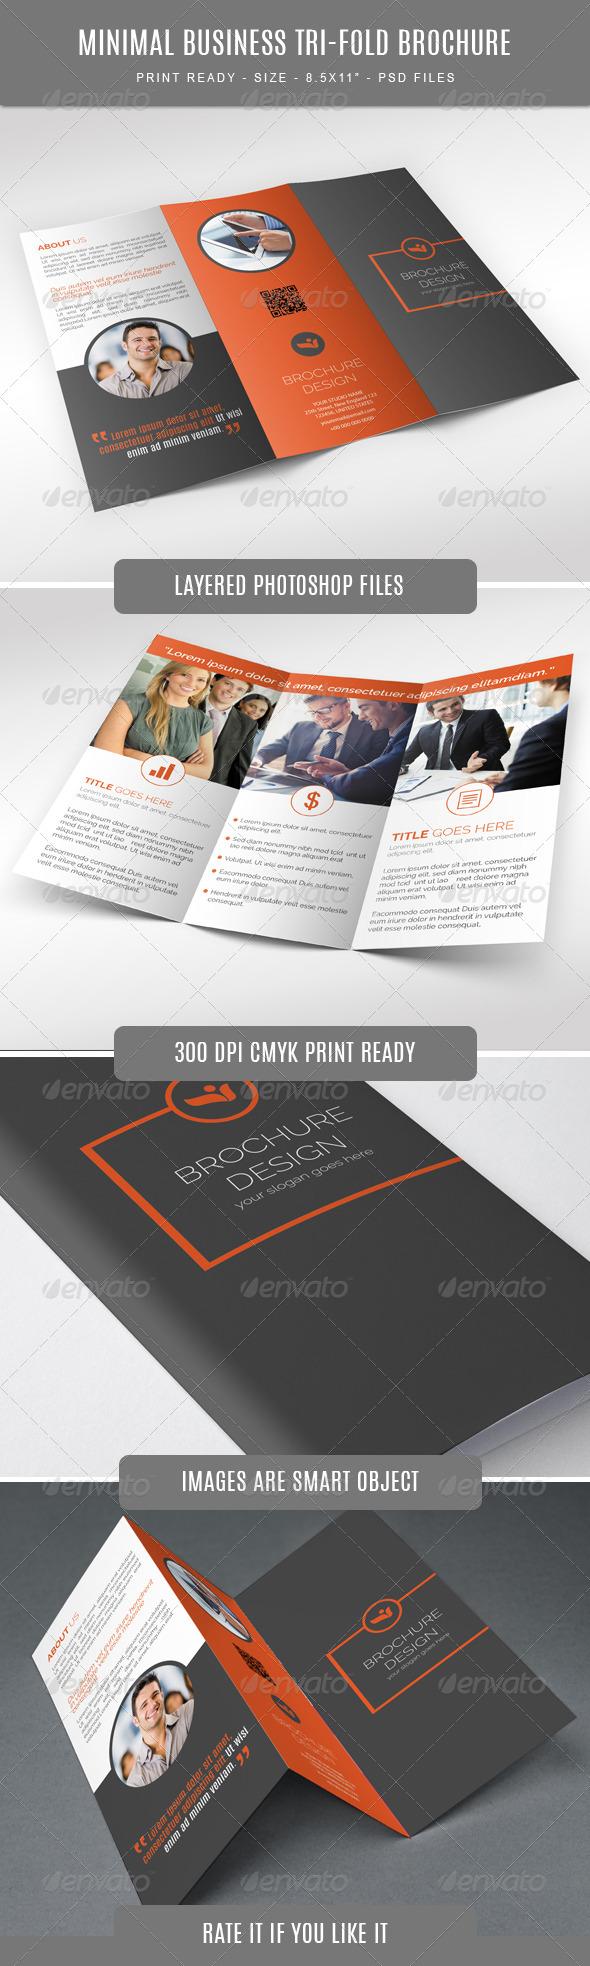 GraphicRiver Minimal Business Tri-Fold Brochure 7806448